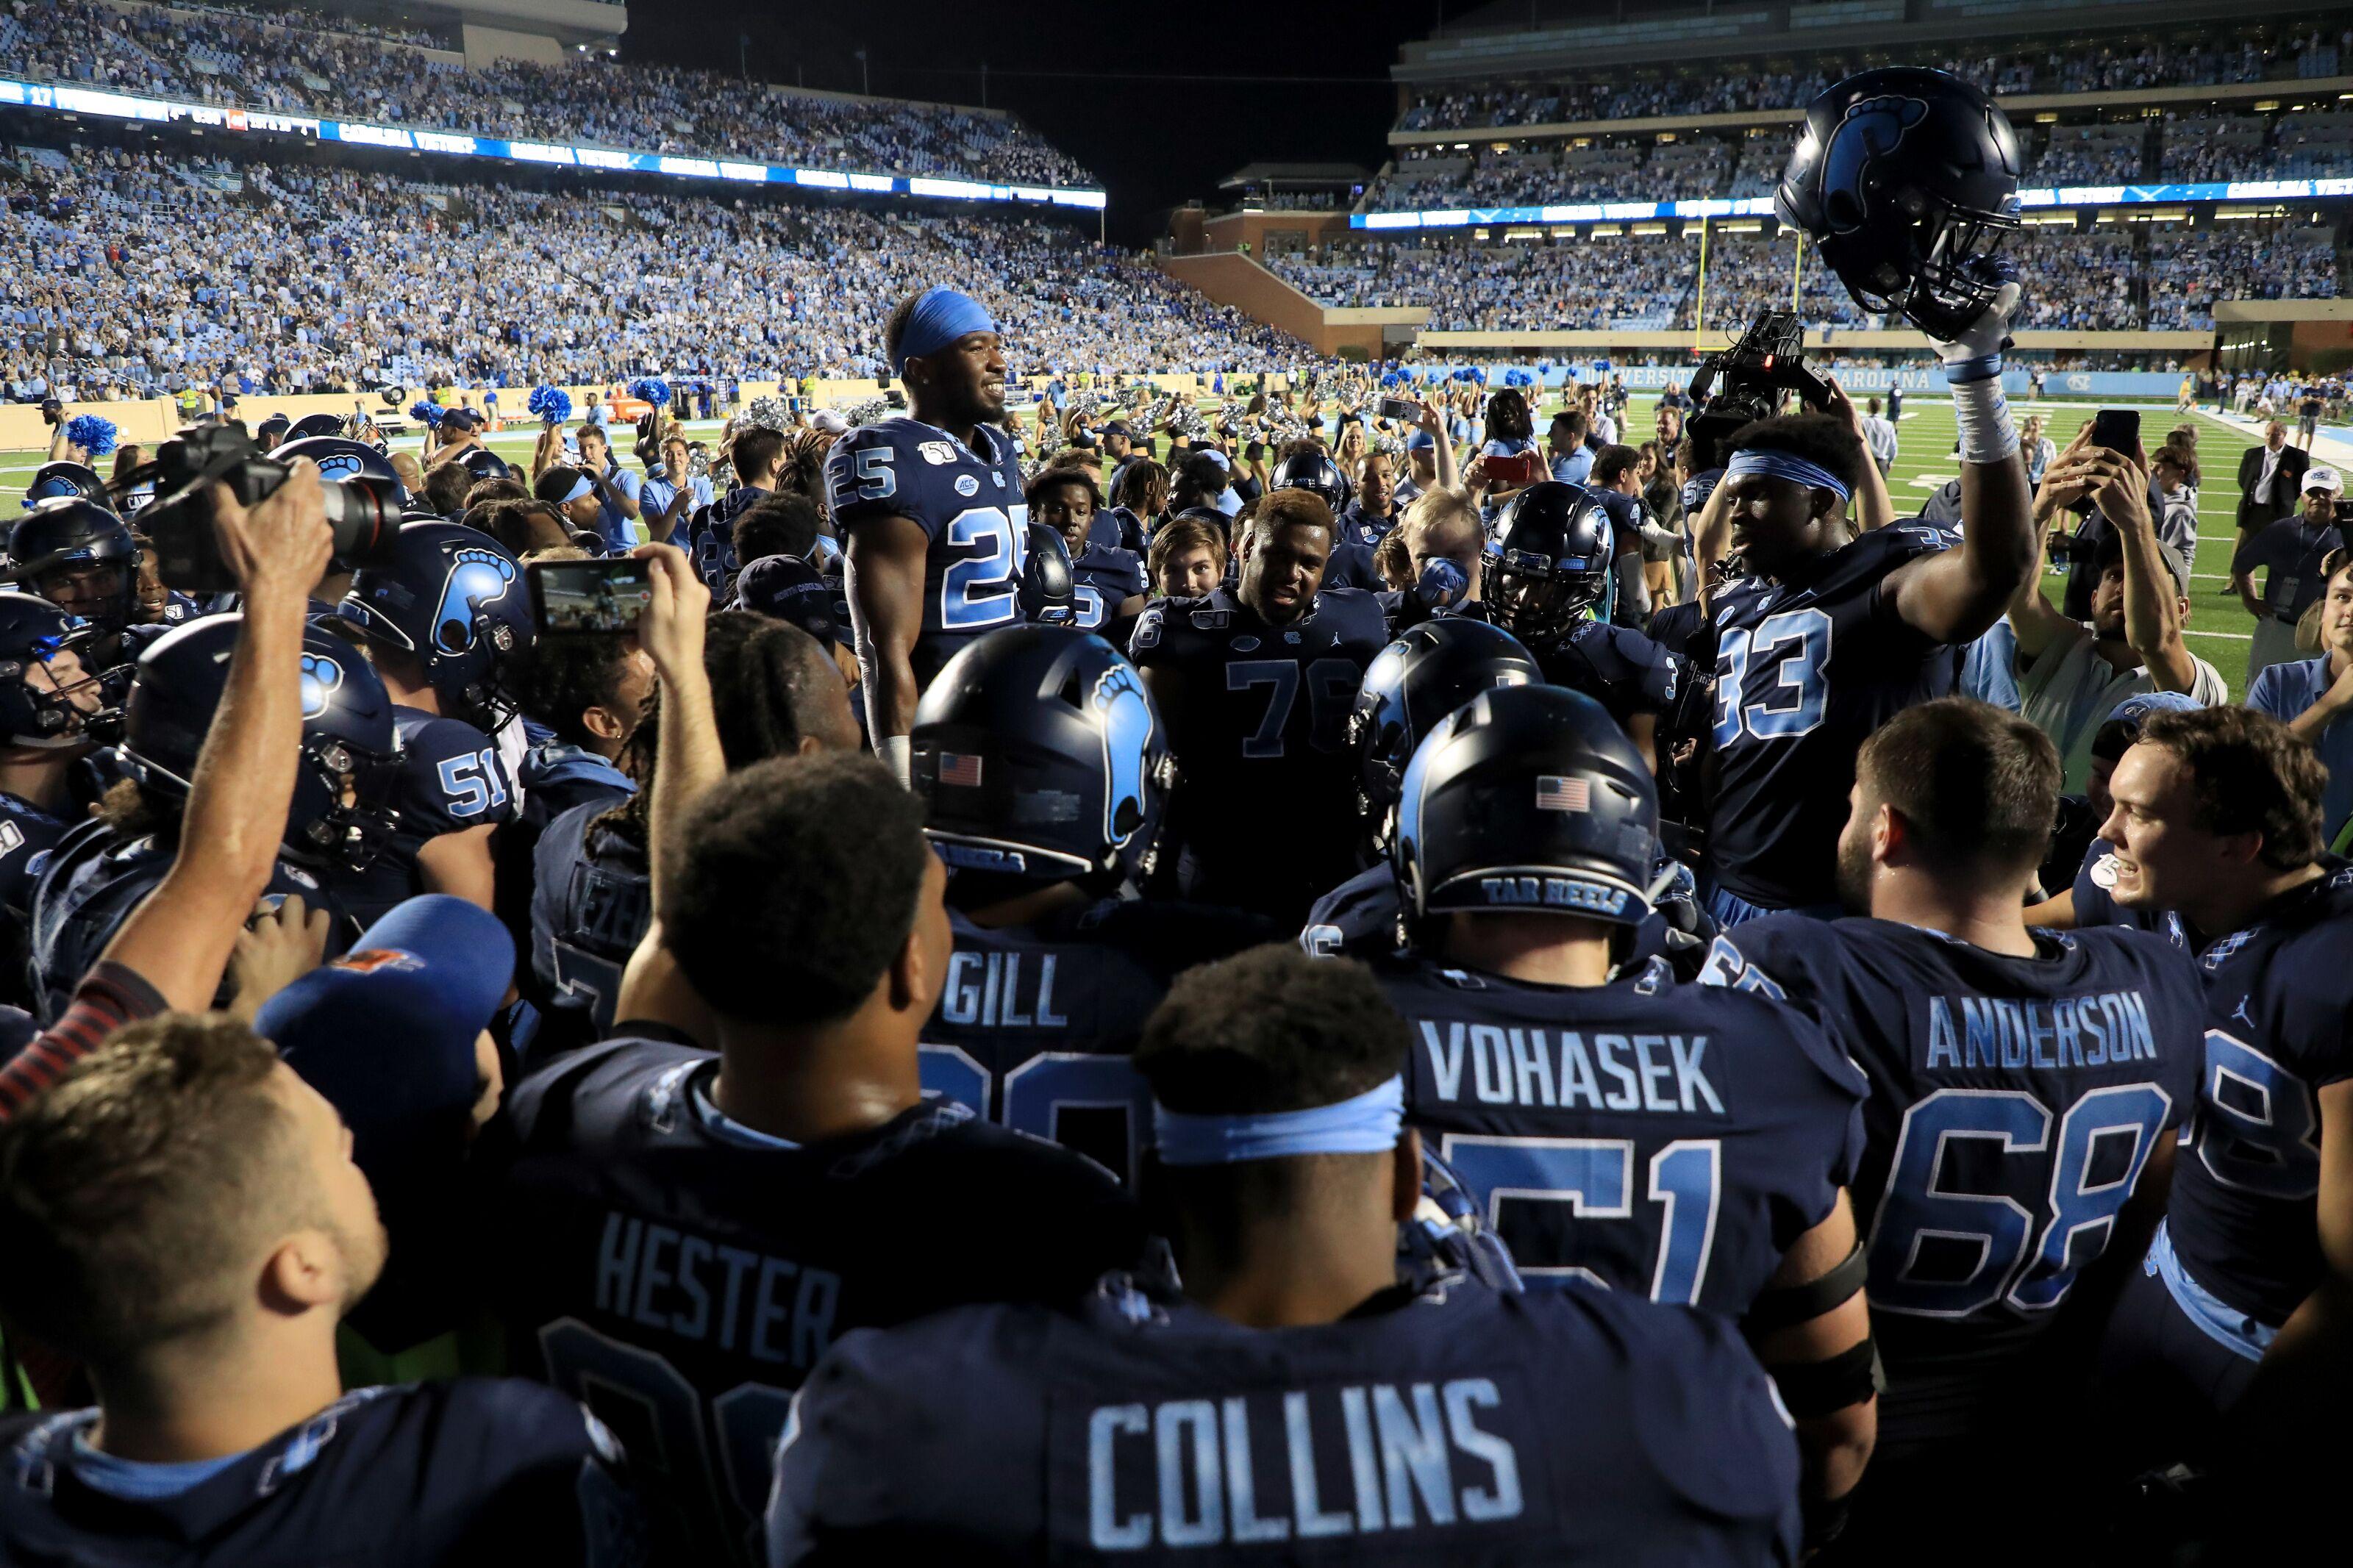 UNC Football: Tar Heels open as favorites vs. Temple in Military Bowl